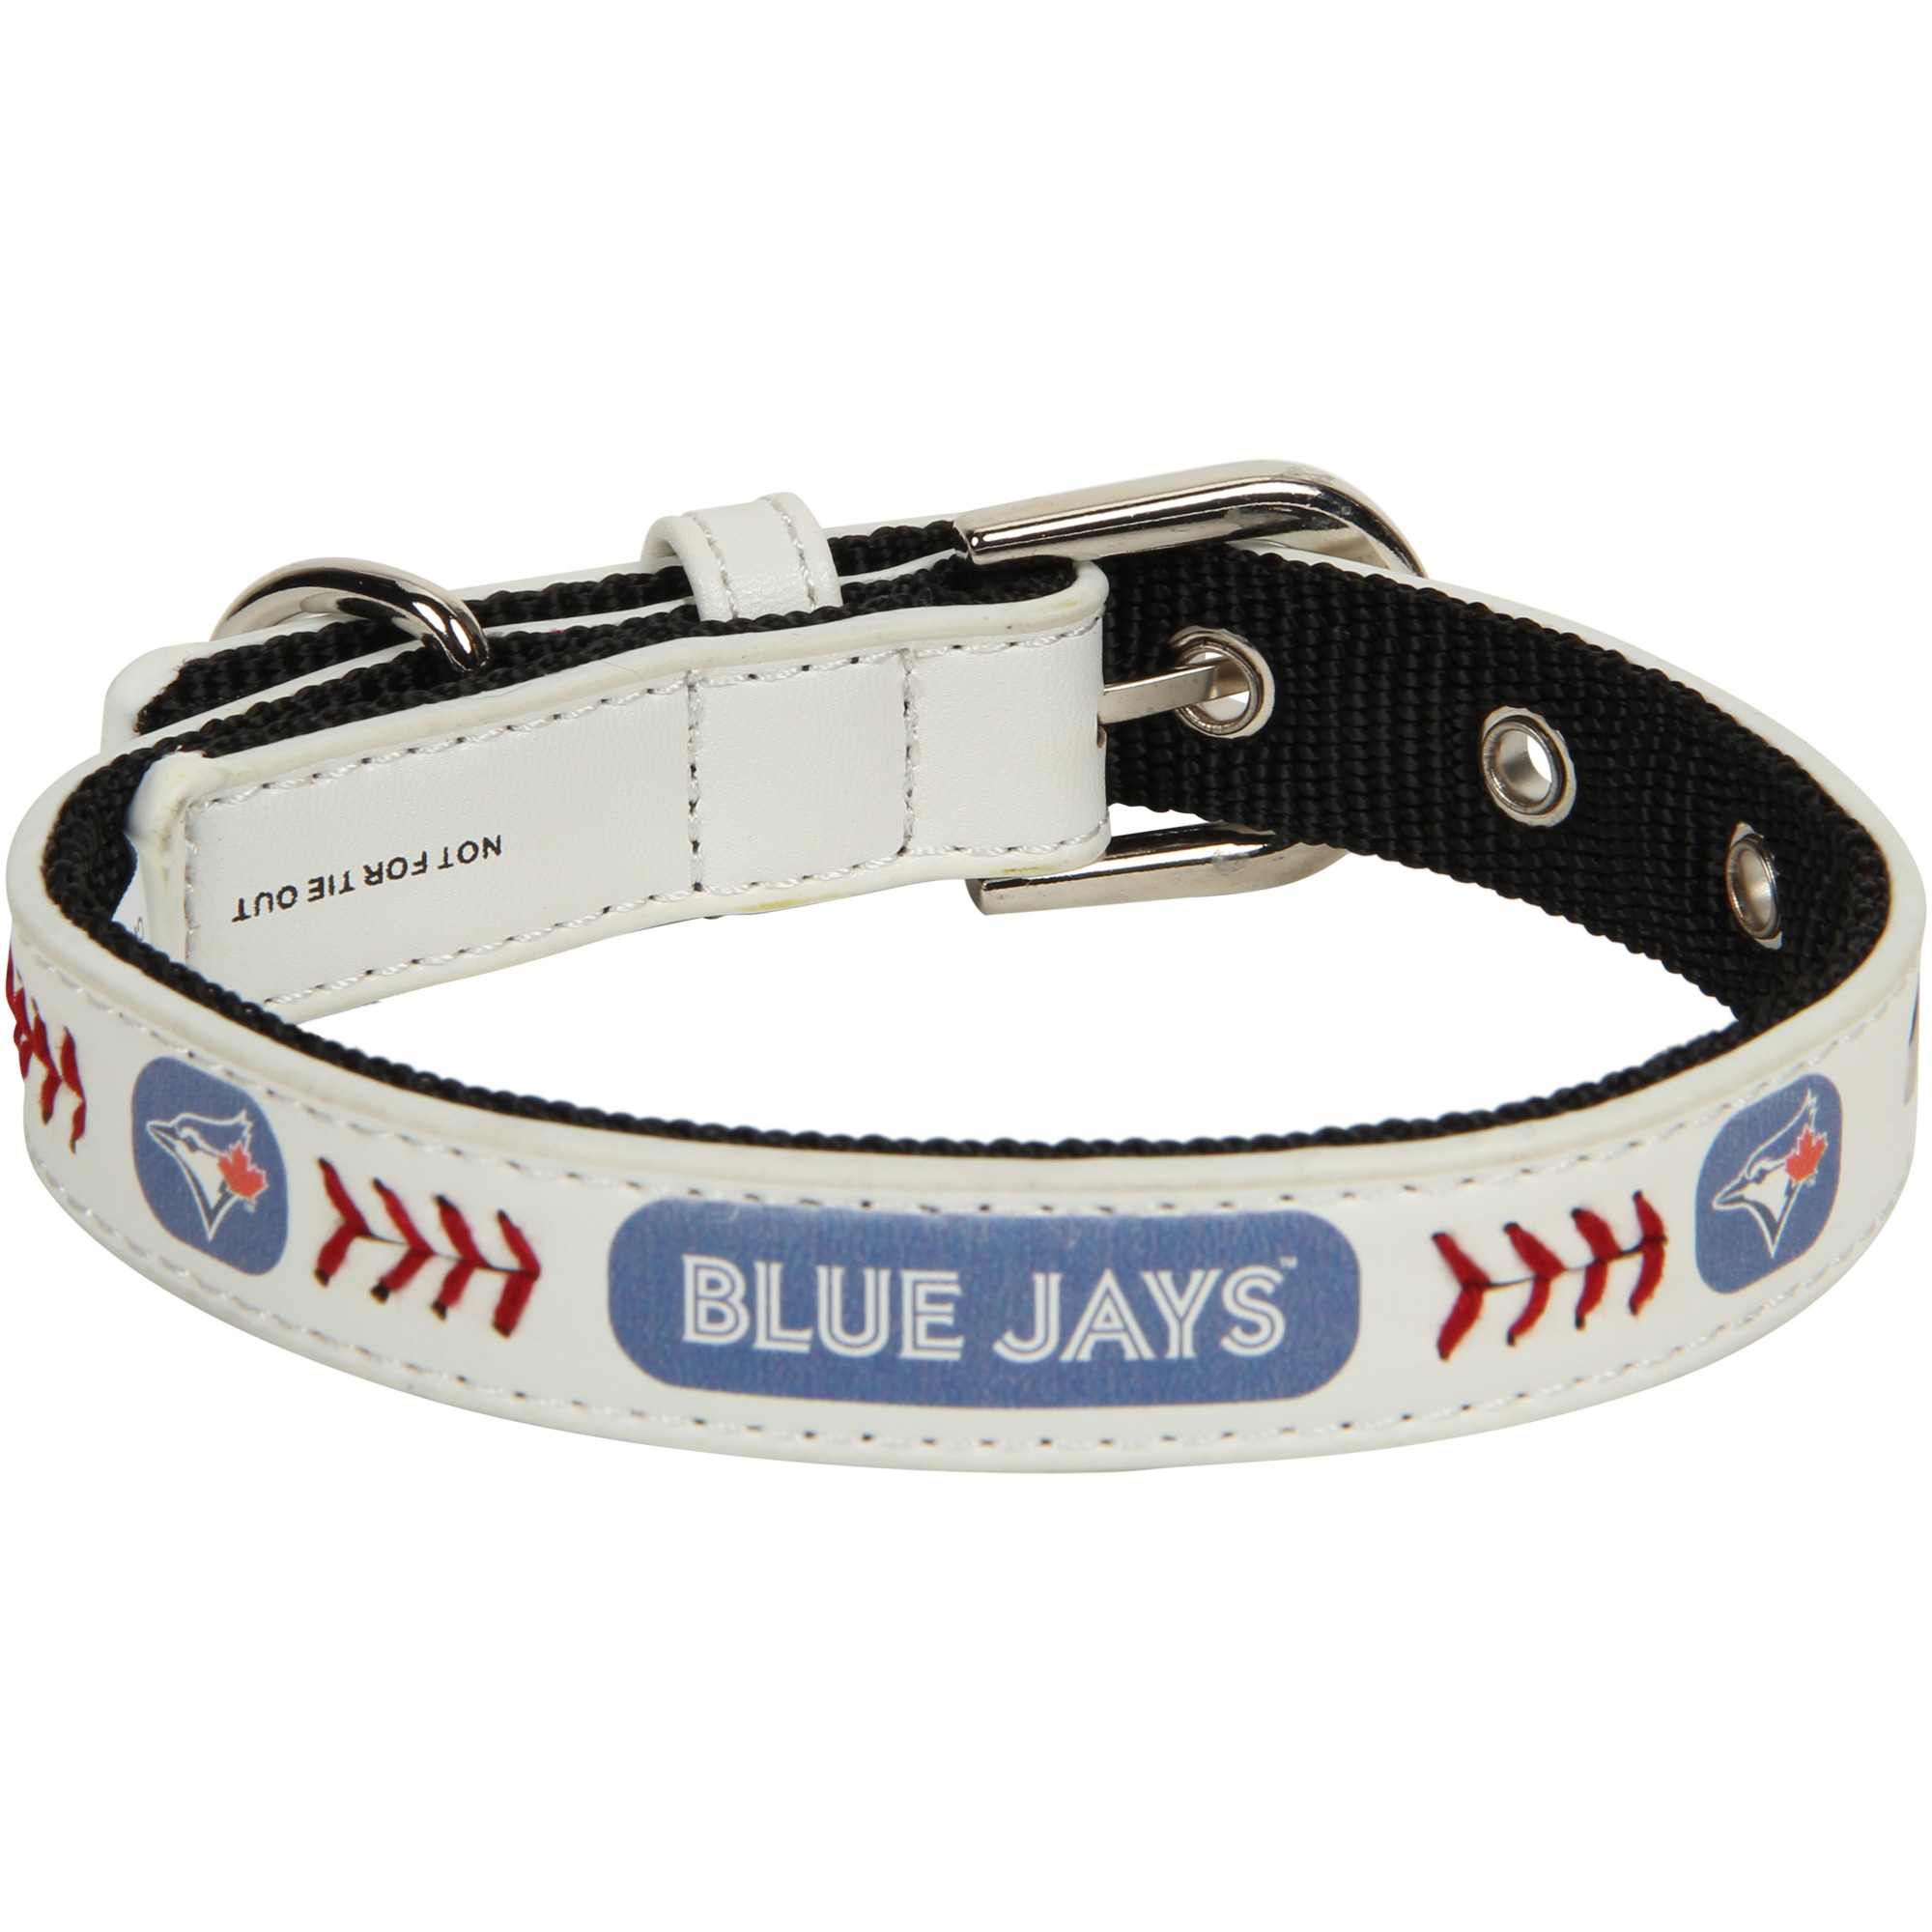 Toronto Blue Jays Classic Leather Collar - White